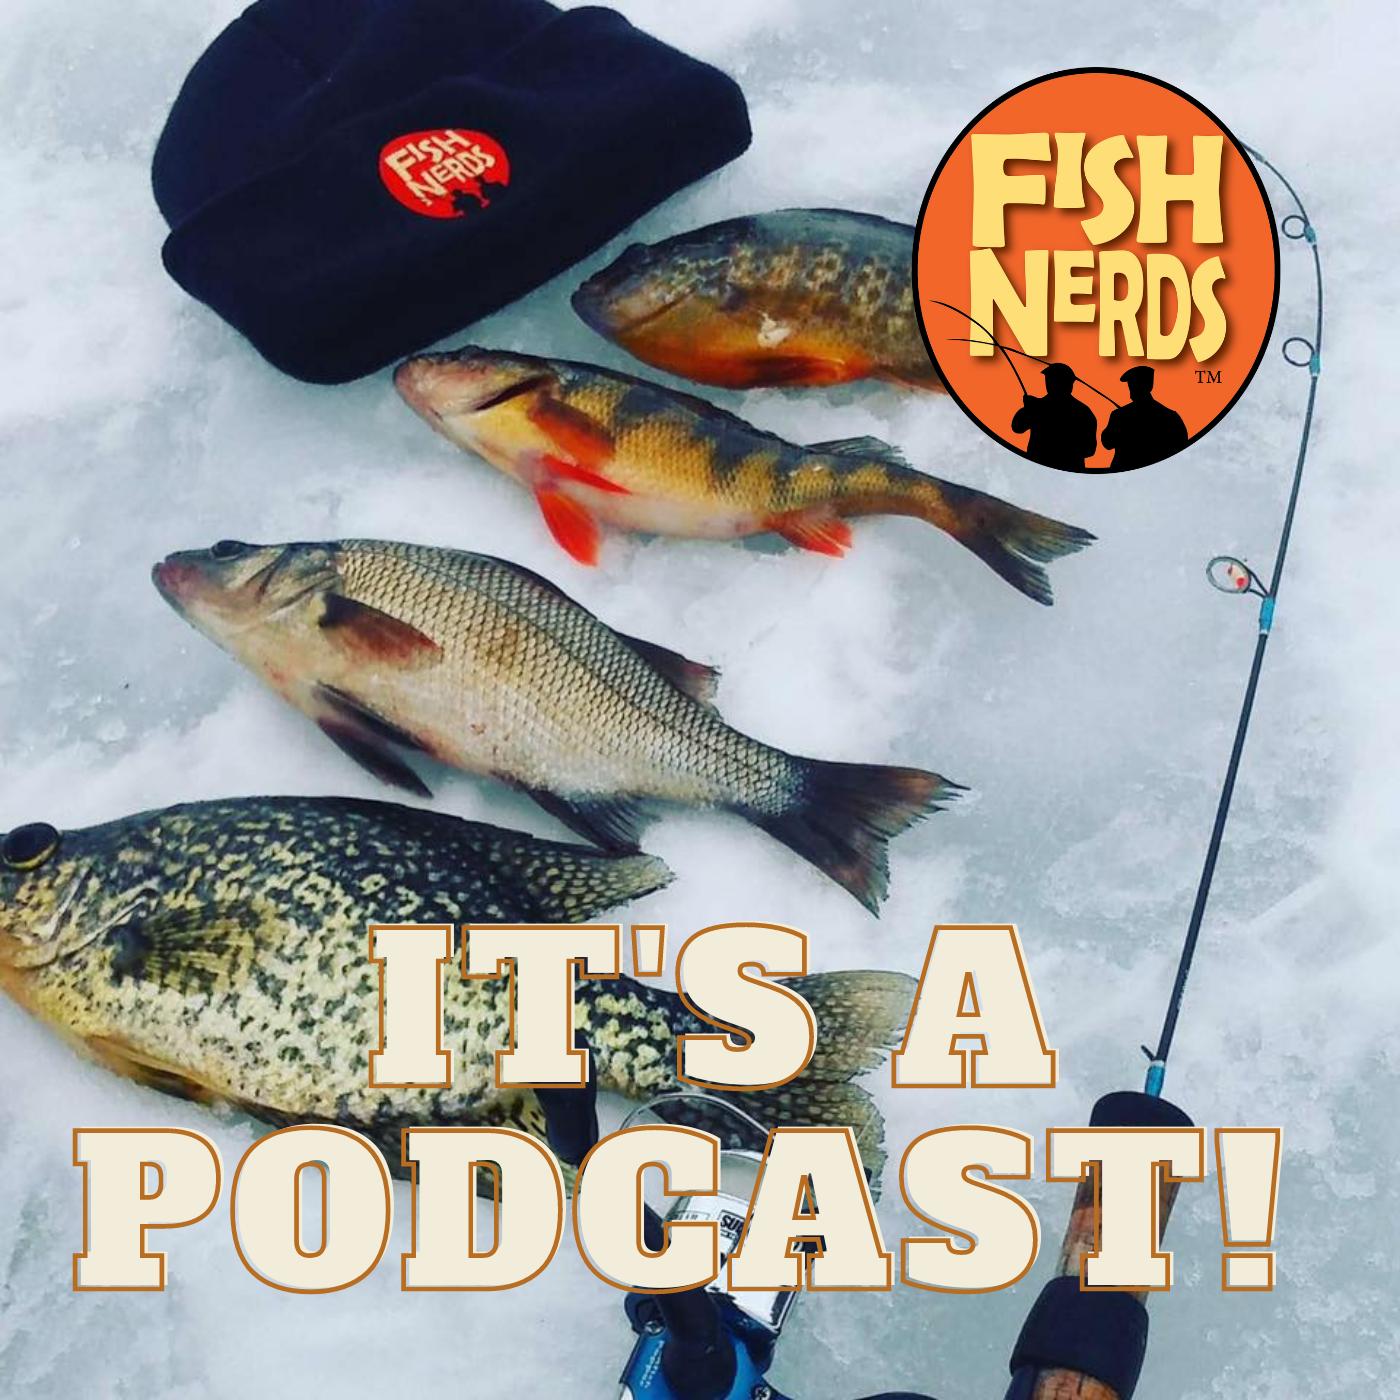 Fish Nerds Fishing Podcast show art